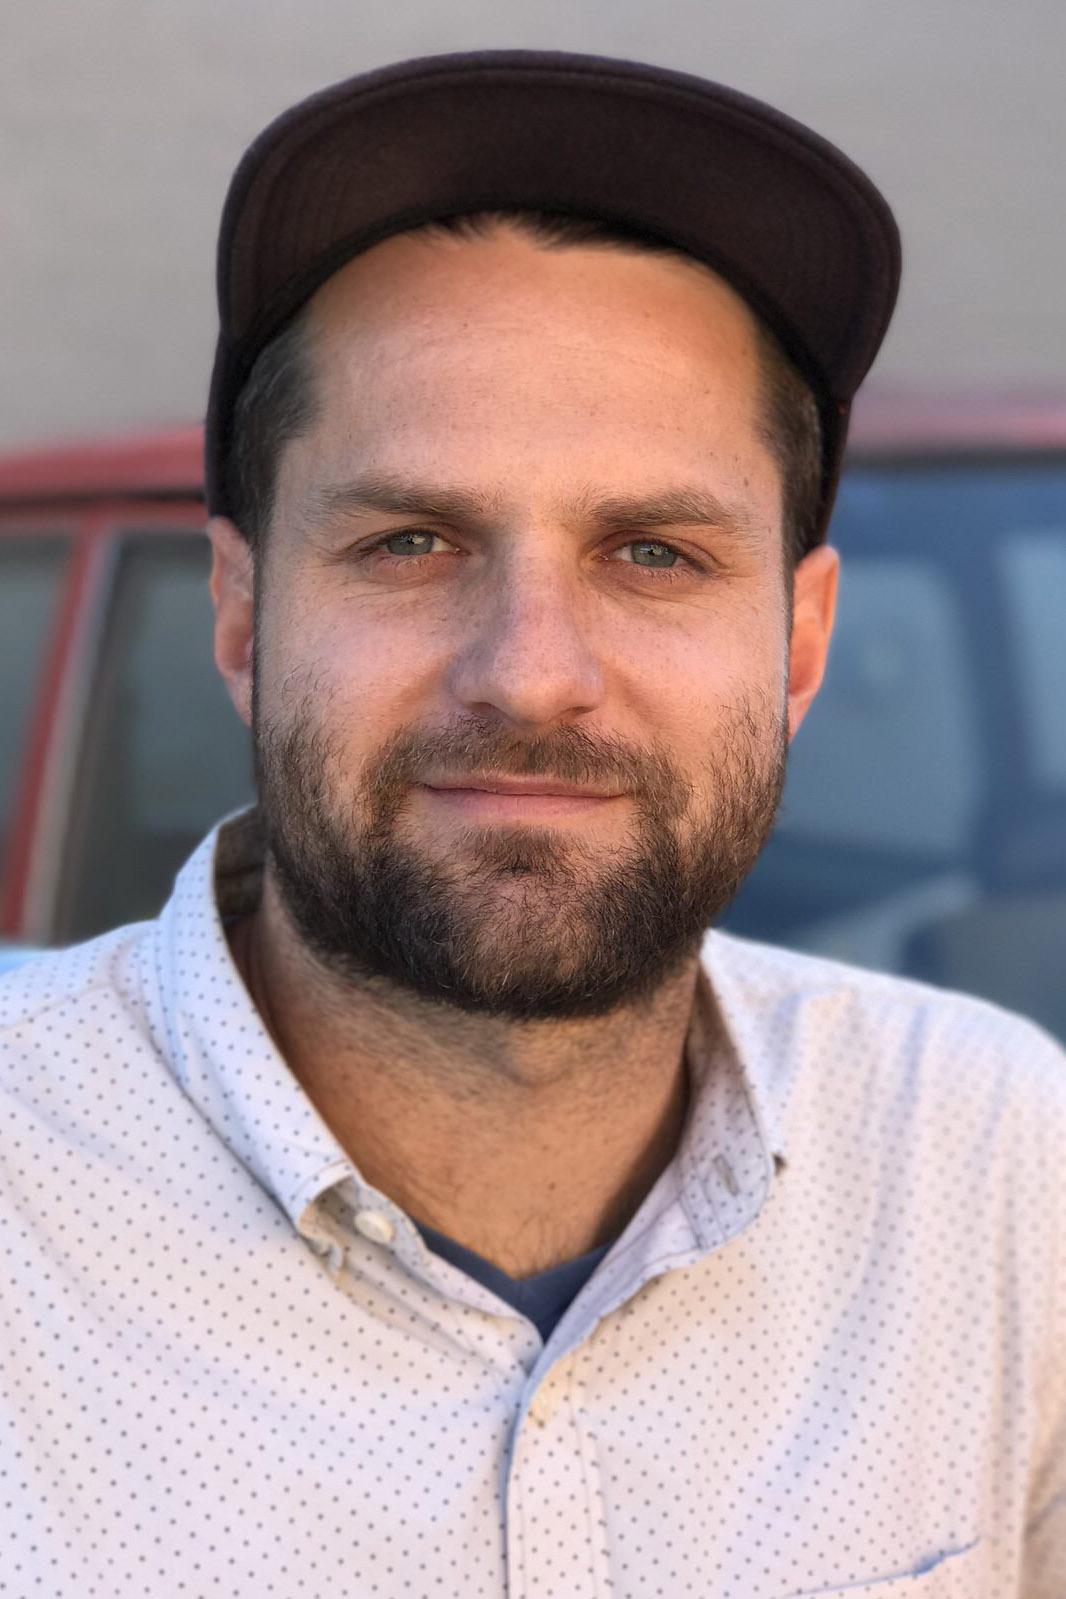 Patrick Dodd , shot on iPhone 7 Plus in Portrait Mode (unedited.)